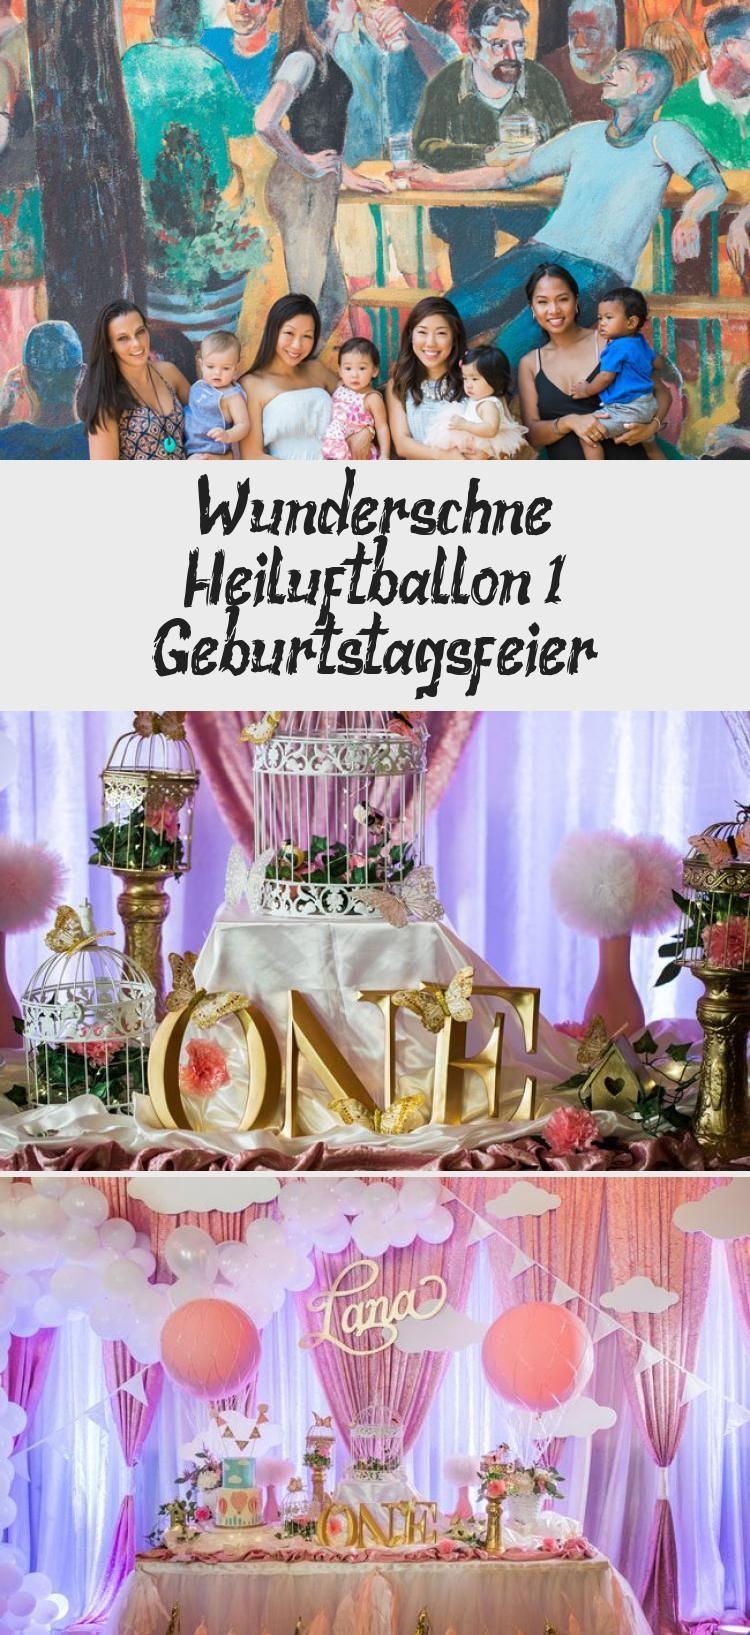 Wunderschone Heissluftballon 1 Geburtstagsfeier Geburtstagsfeier